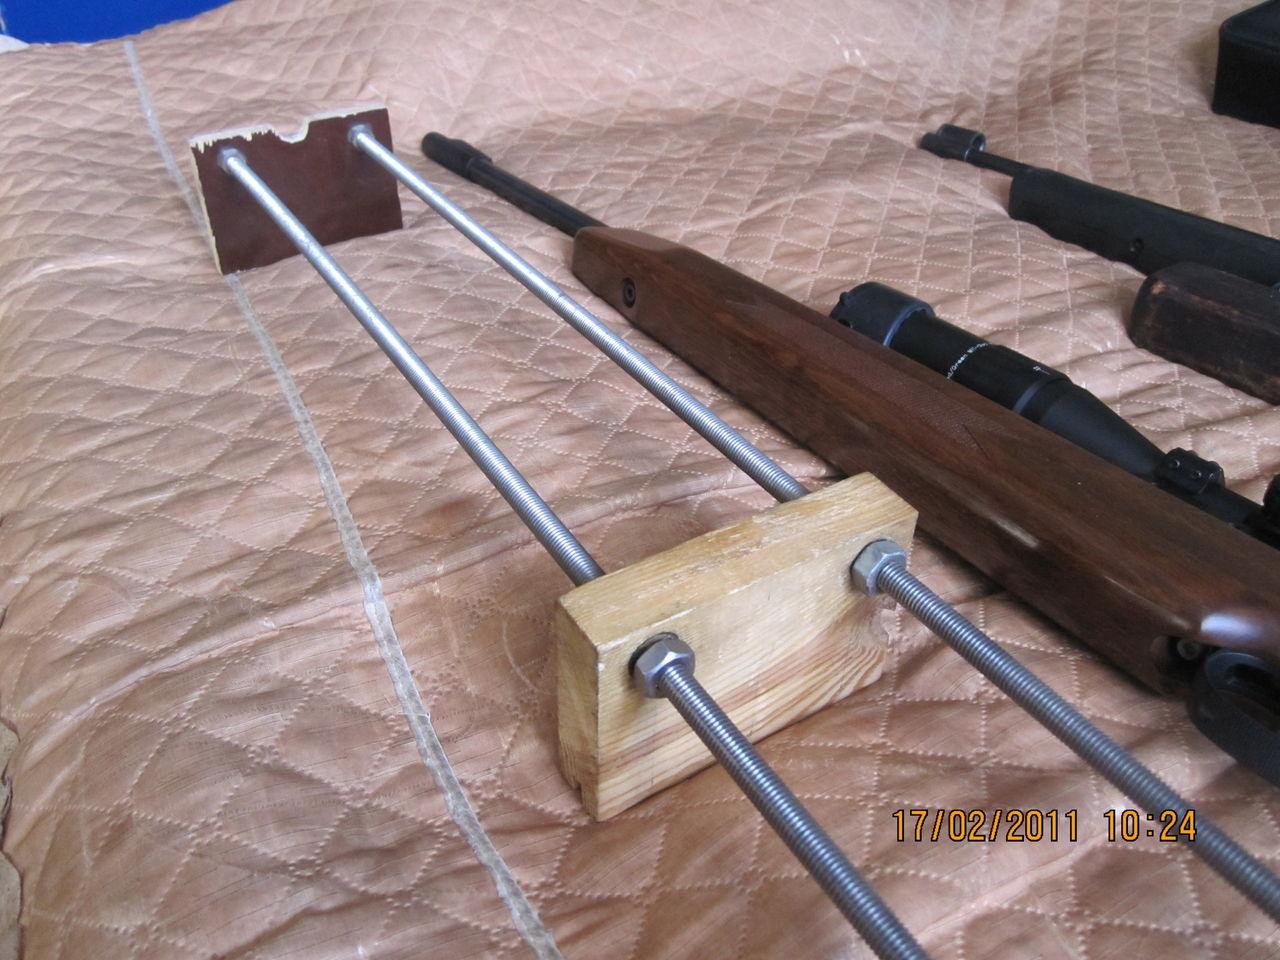 Пружина для пневматической винтовки своими руками